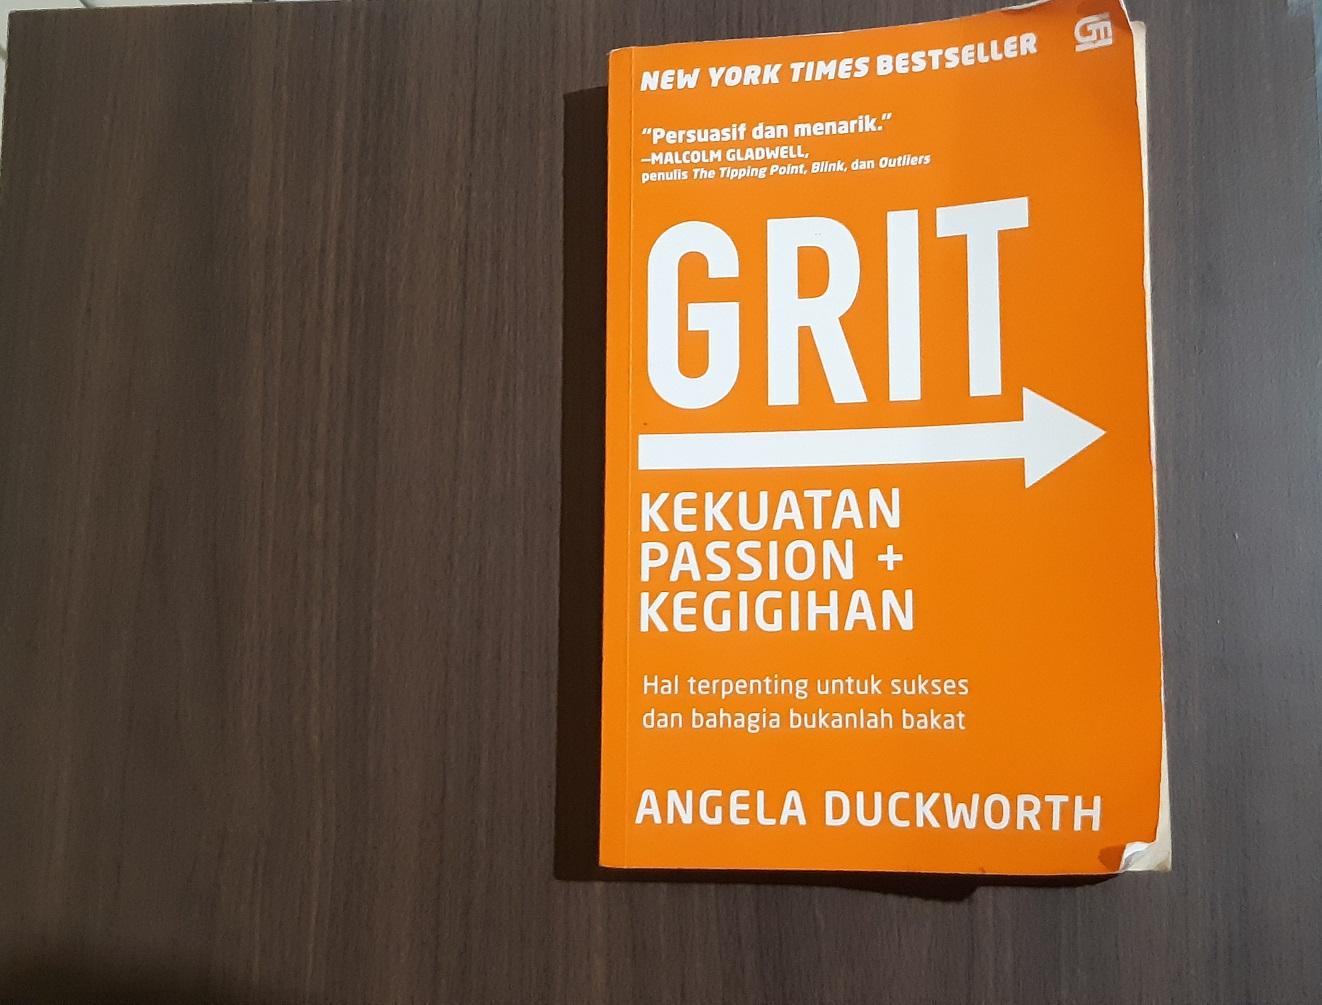 Rangkuman Buku GRIT by Angela Duckworth